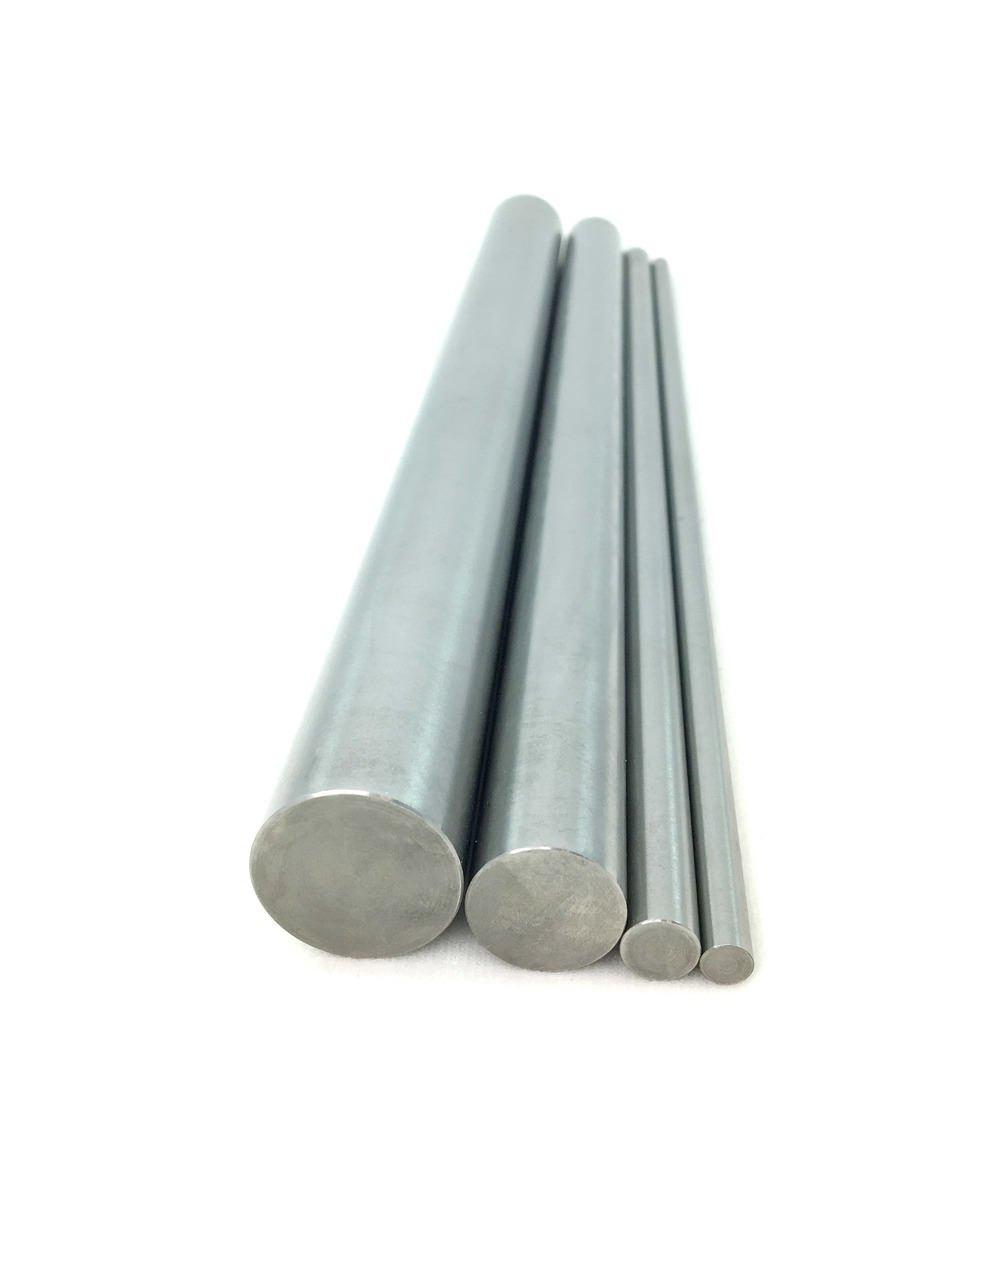 99.95% Pure Tungsten Rod - 0.25'' Diameter x 20'' Length by Midwest Tungsten Service